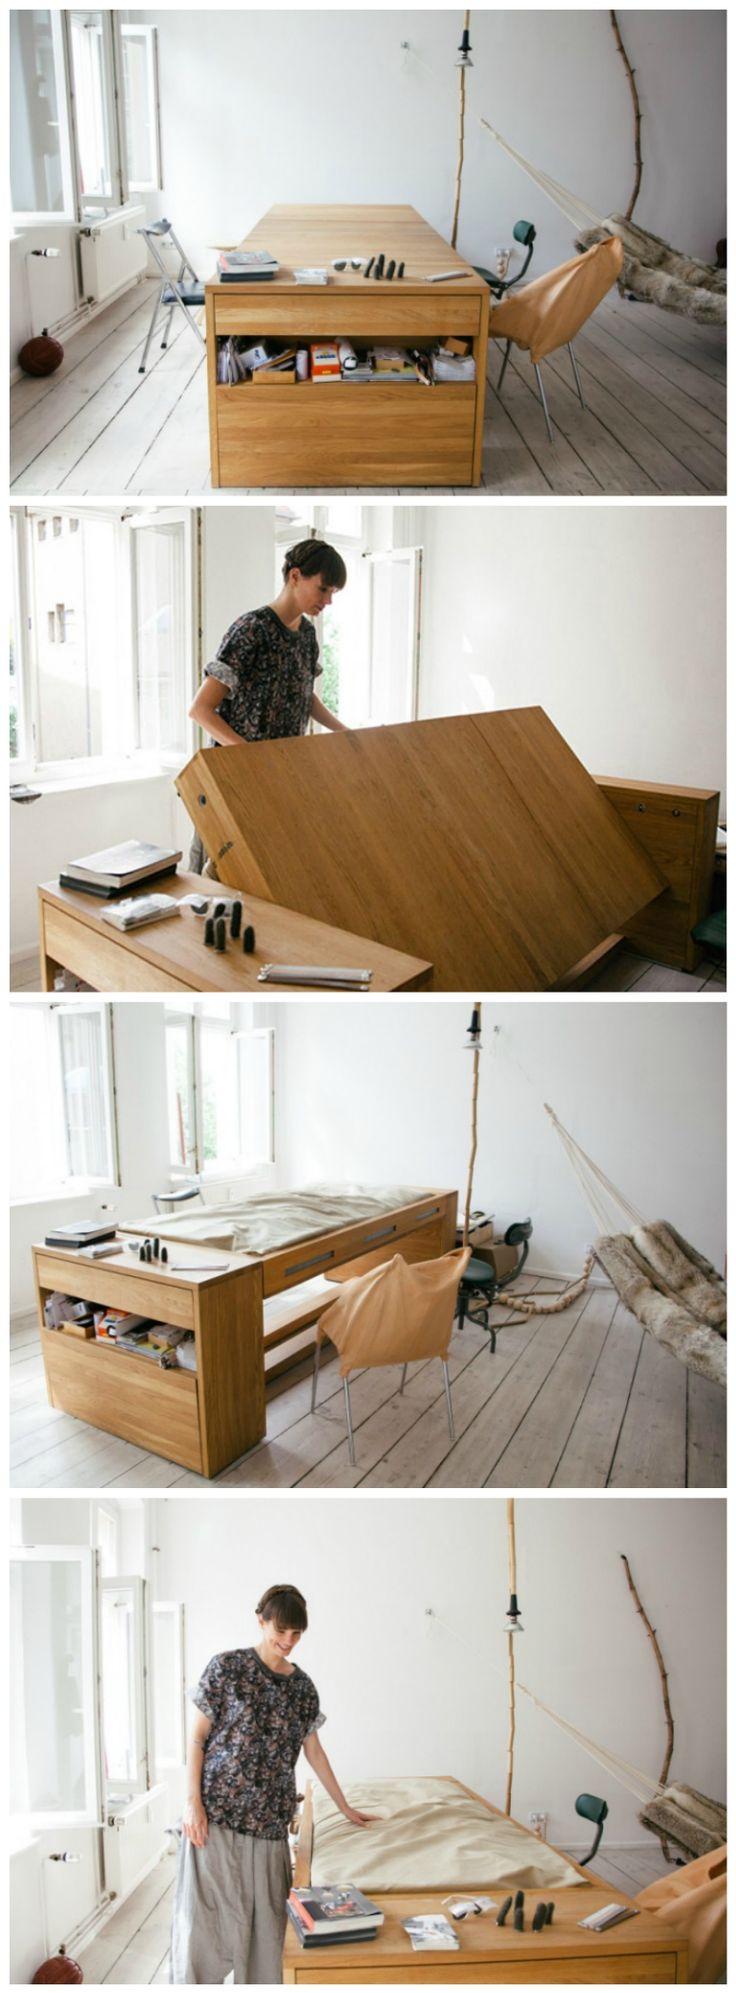 25+ populairste ideeën over Futuristische Meubelen op Pinterest ... - Space Saving Idea: A Desk That Transforms into a Bed